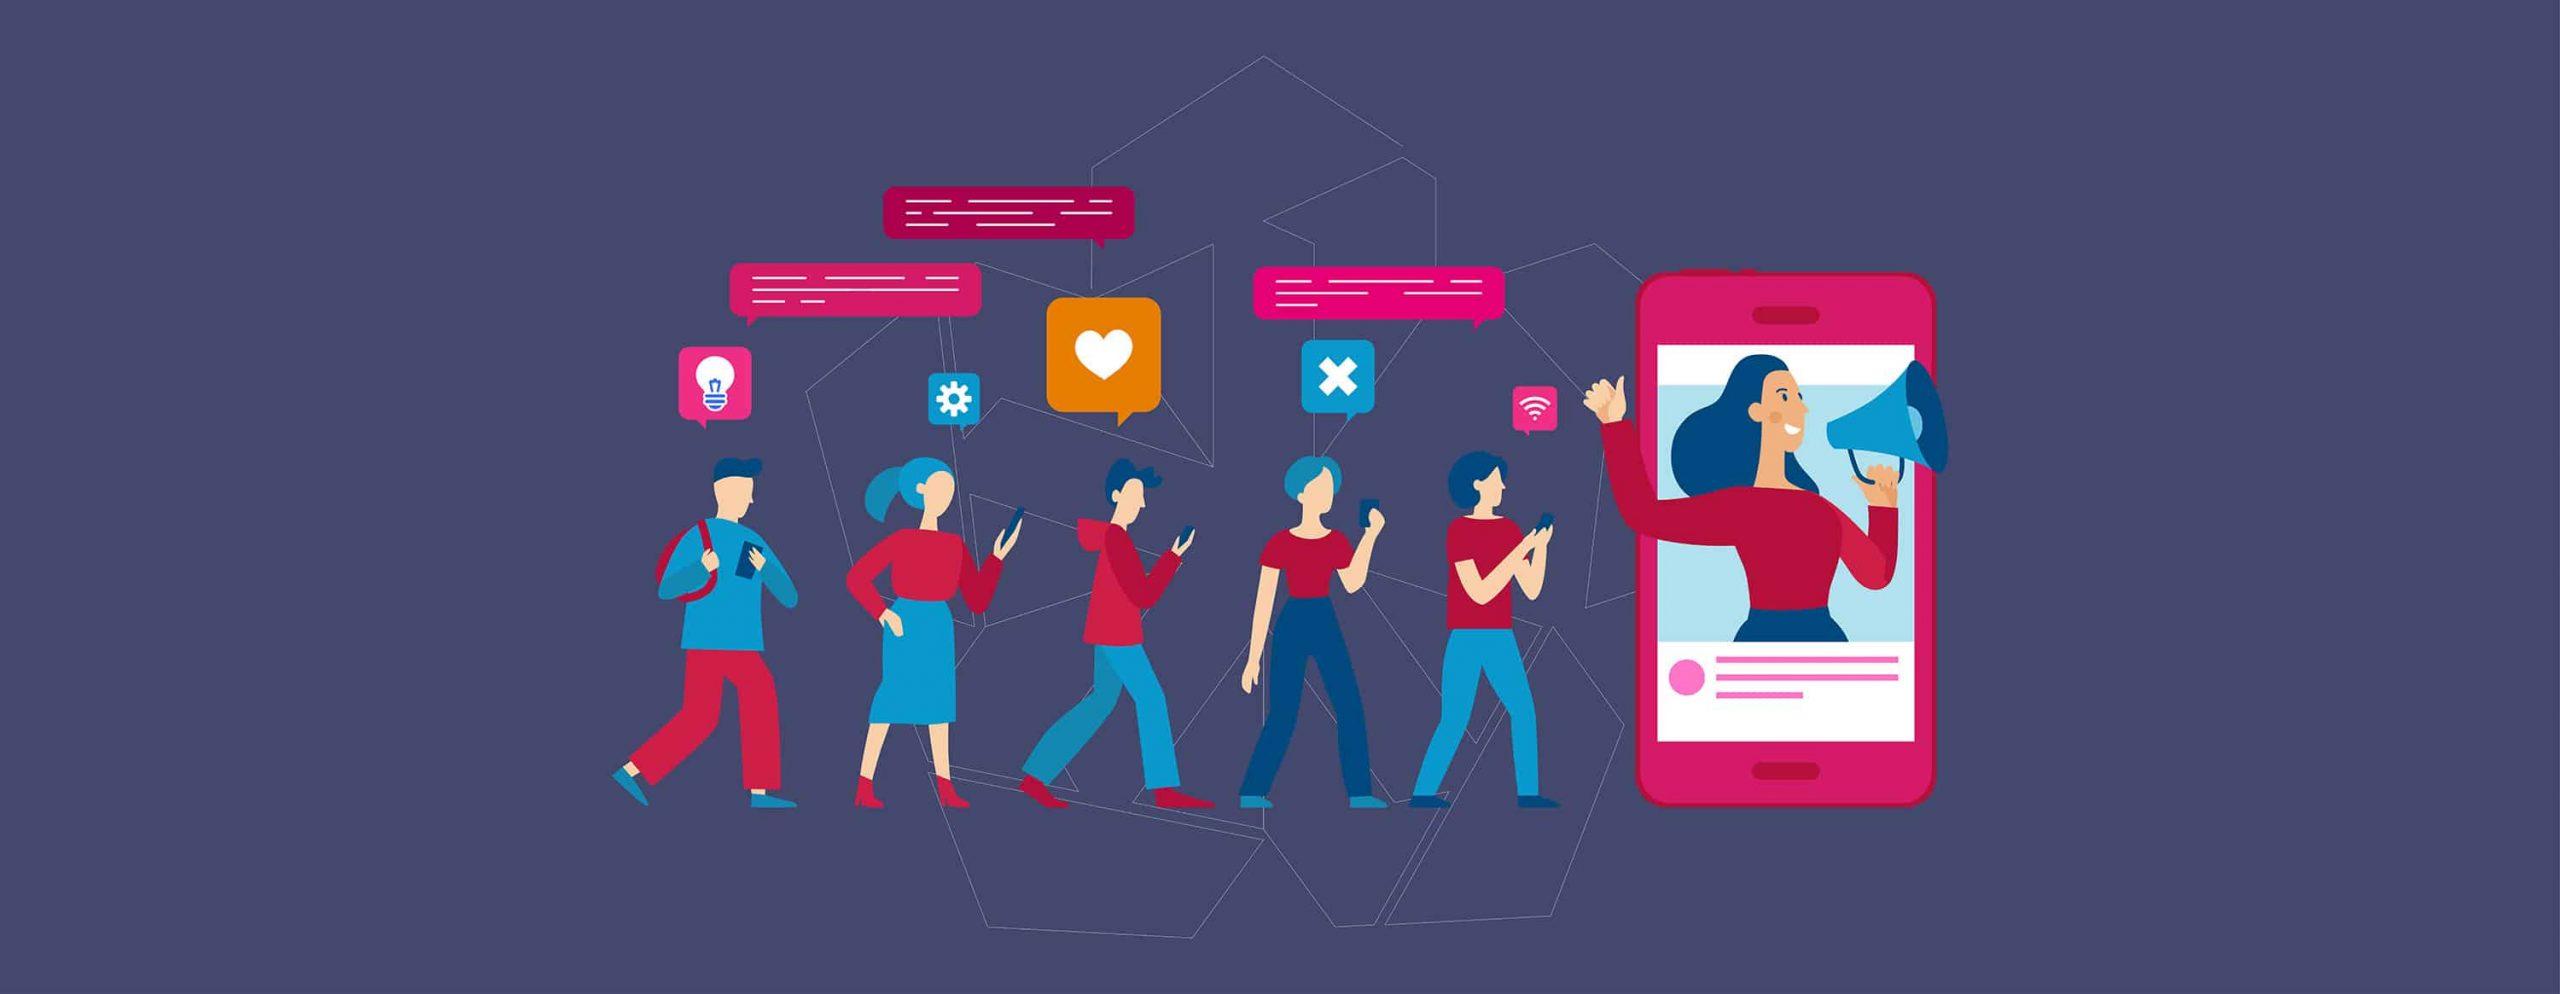 L'User Generated Content (UGC) comme levier indispensable pour les marques